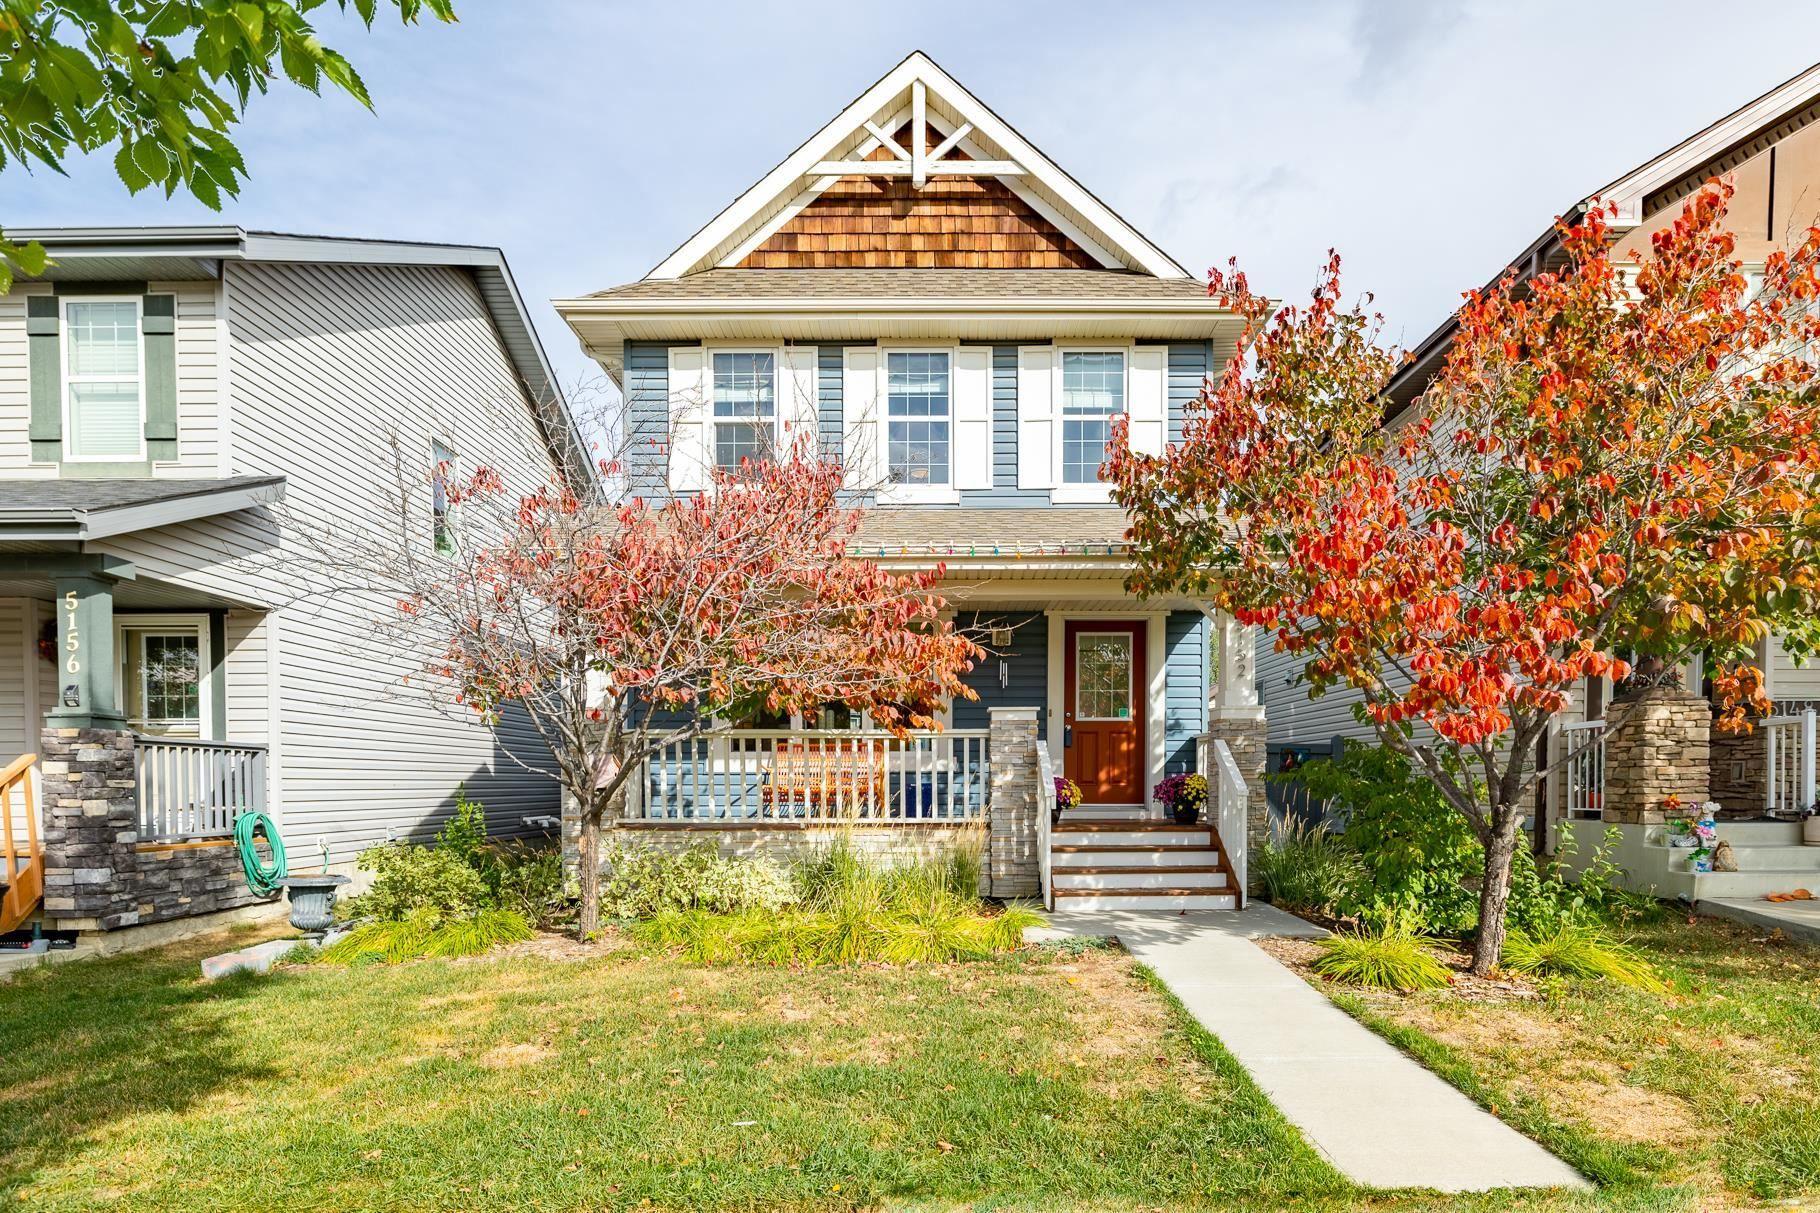 Main Photo: 5152 4 Avenue in Edmonton: Zone 53 House for sale : MLS®# E4263328